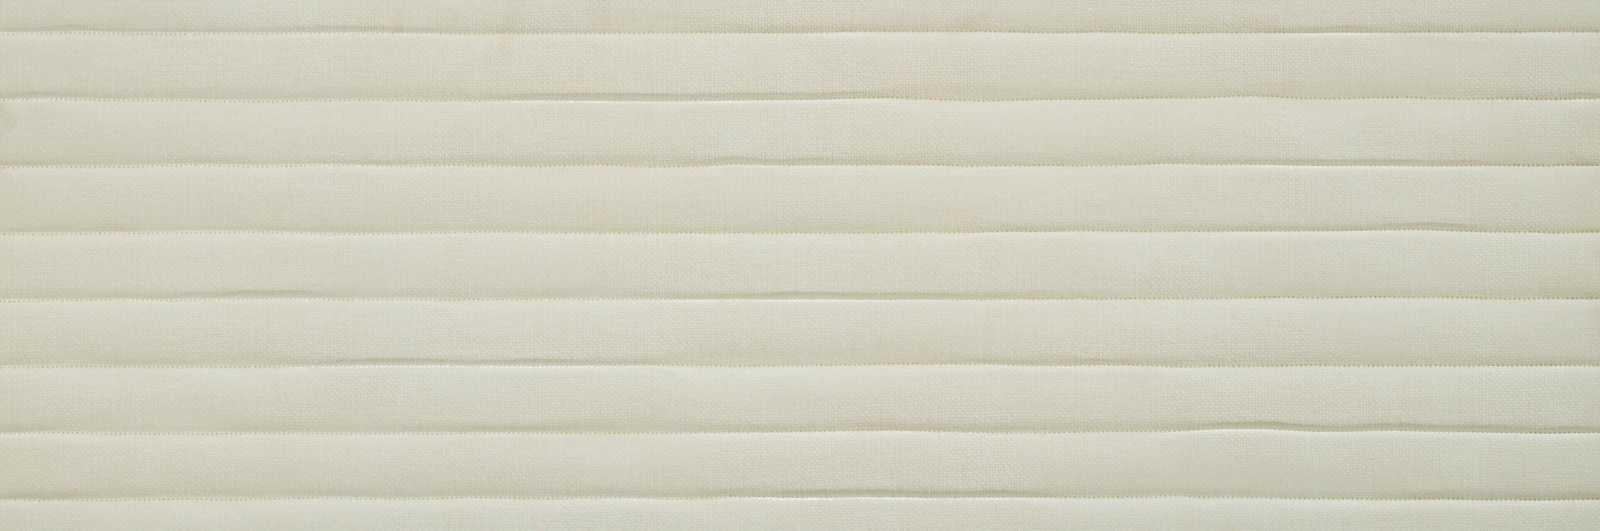 Декорни плочки Fabric Linen Decoro Lux 40x120